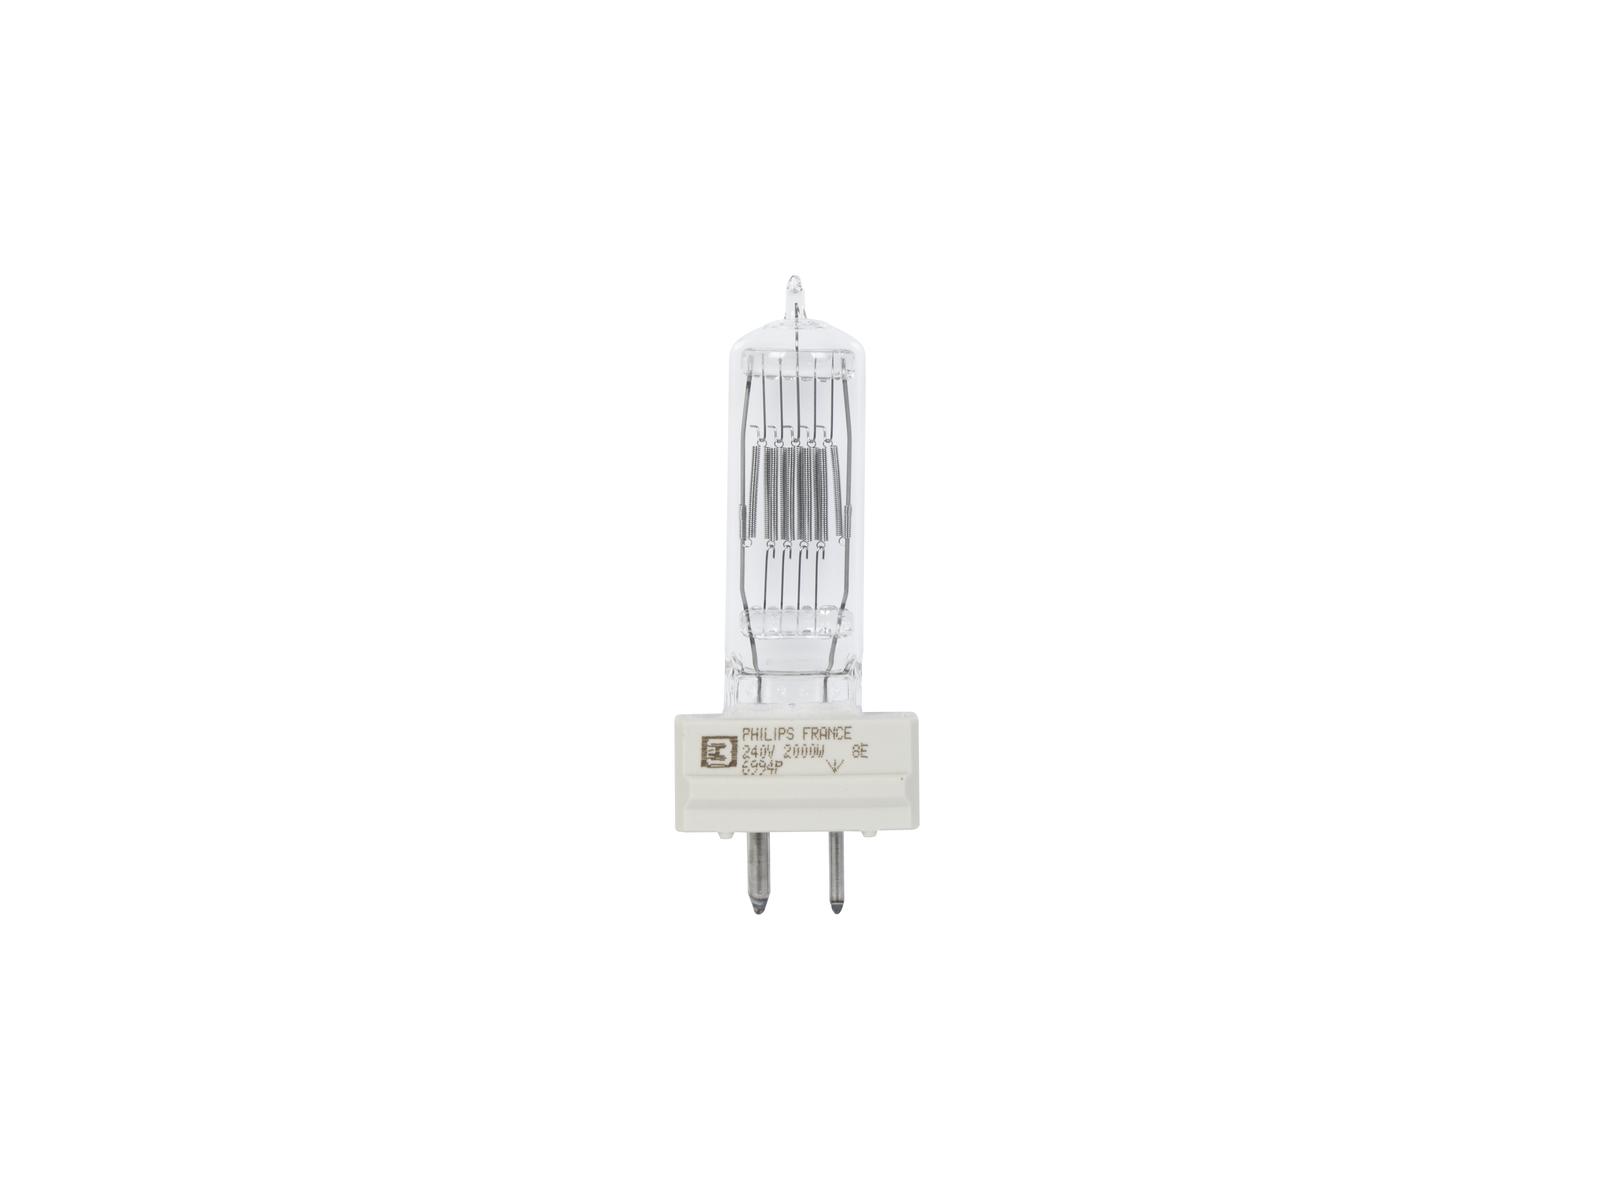 PHILIPS 6994P 230V/2000W GY-16 480h 3200K